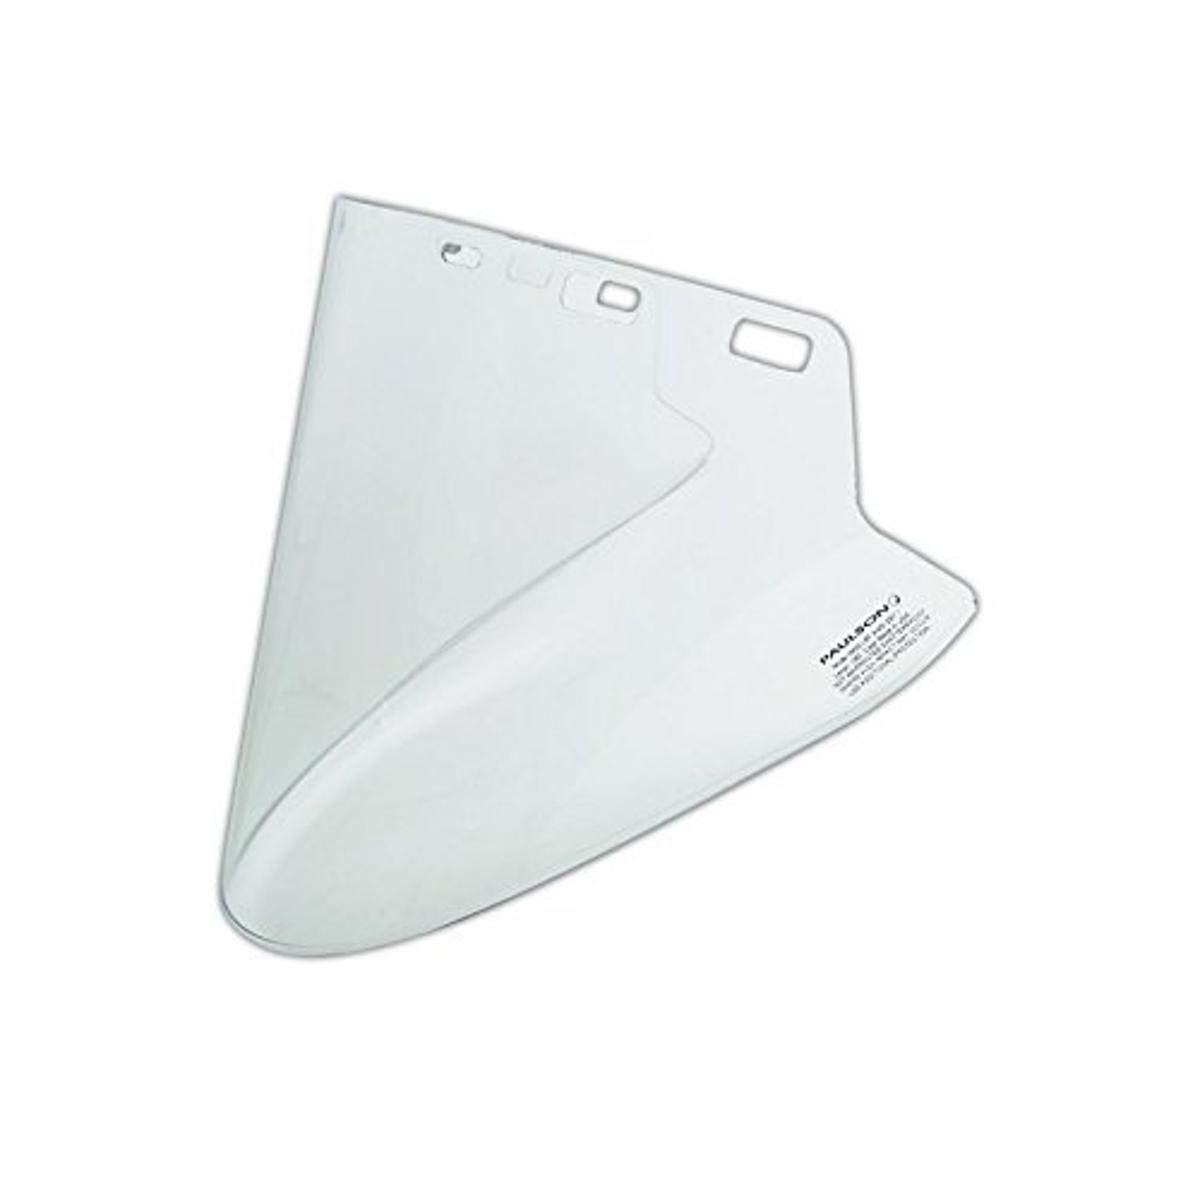 CLEAR VISOR HIGH TEMP FORMED LEXAN 10X20X.060 SKU - PAUL//IM20-L6F